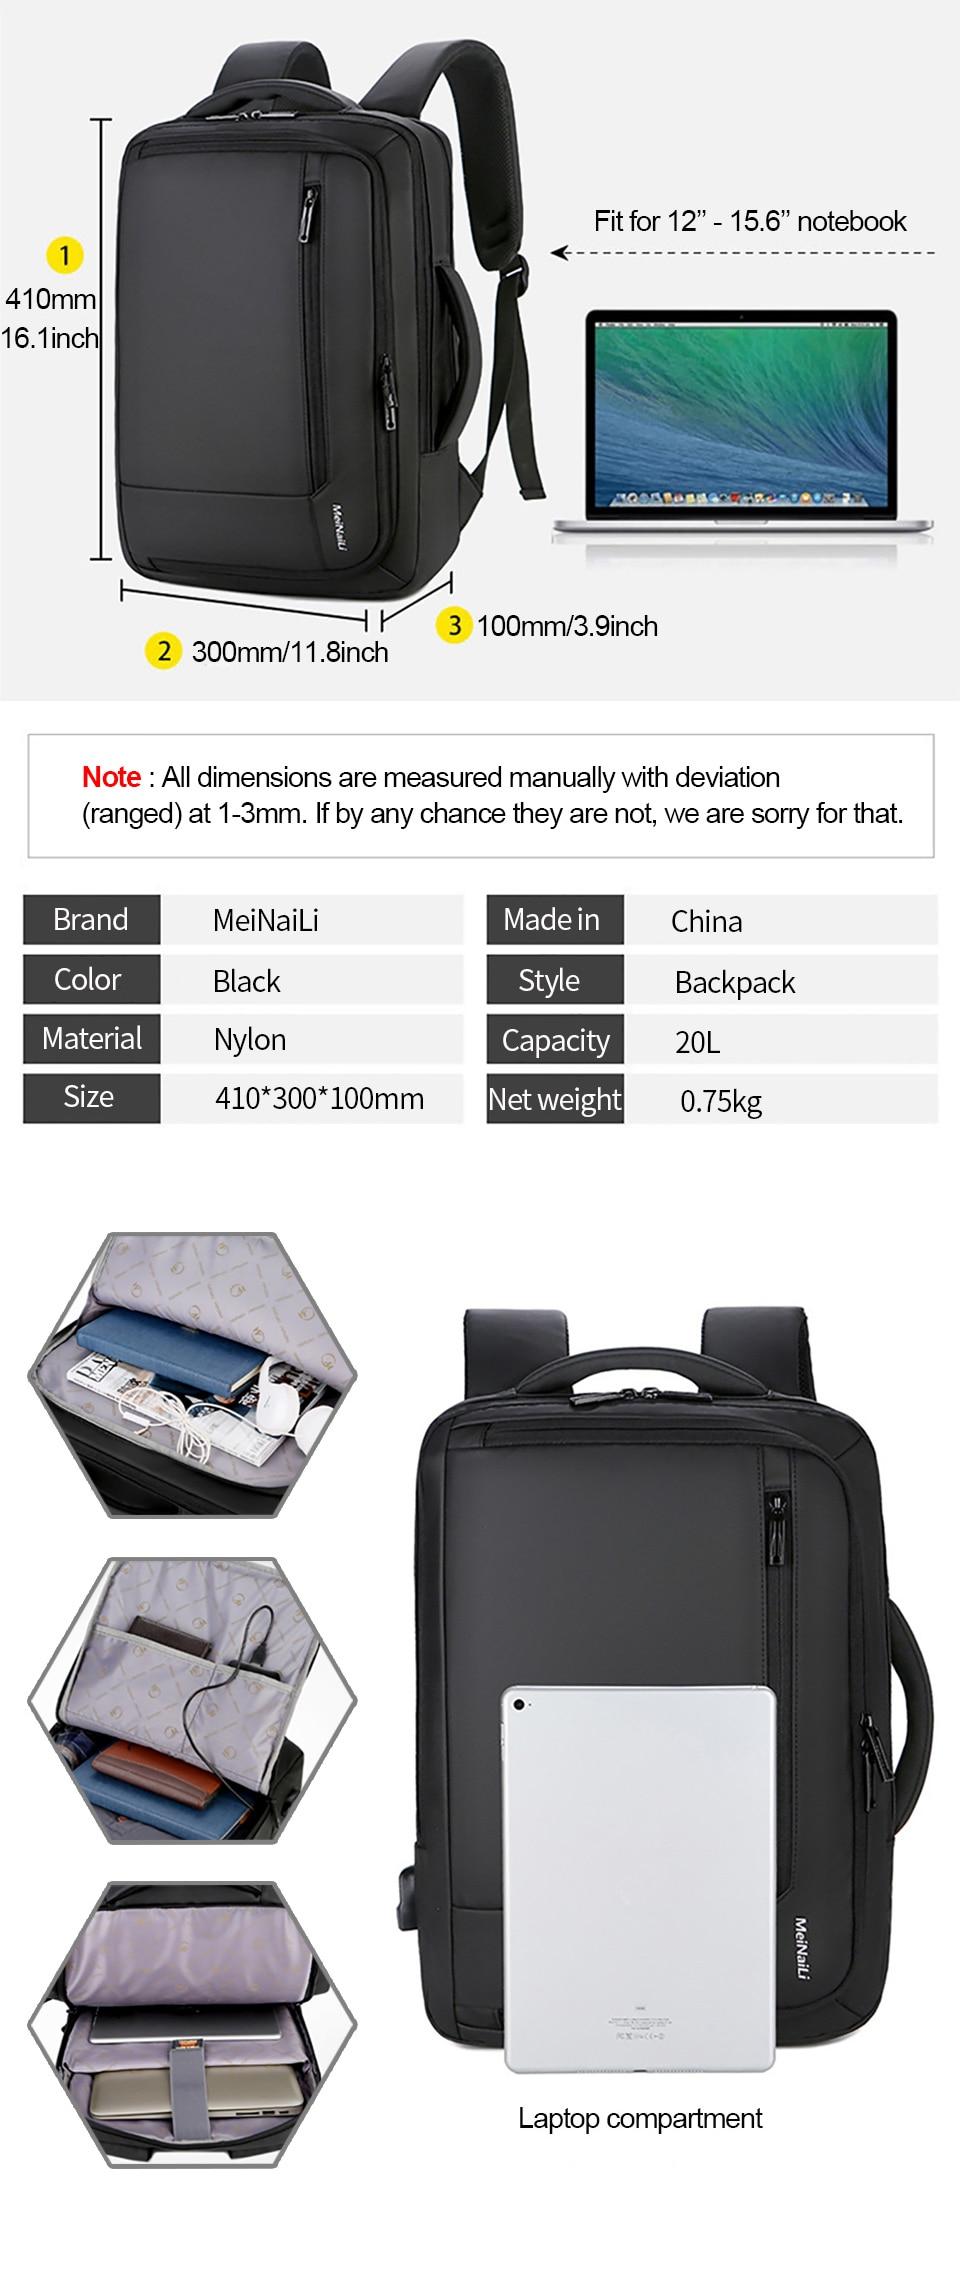 3 Multifunction USB Backpack Man Bag 15.6inch Laptop Backpacks Travel Bags Large Capacity Luggage Backpacking Waterproof Notebook